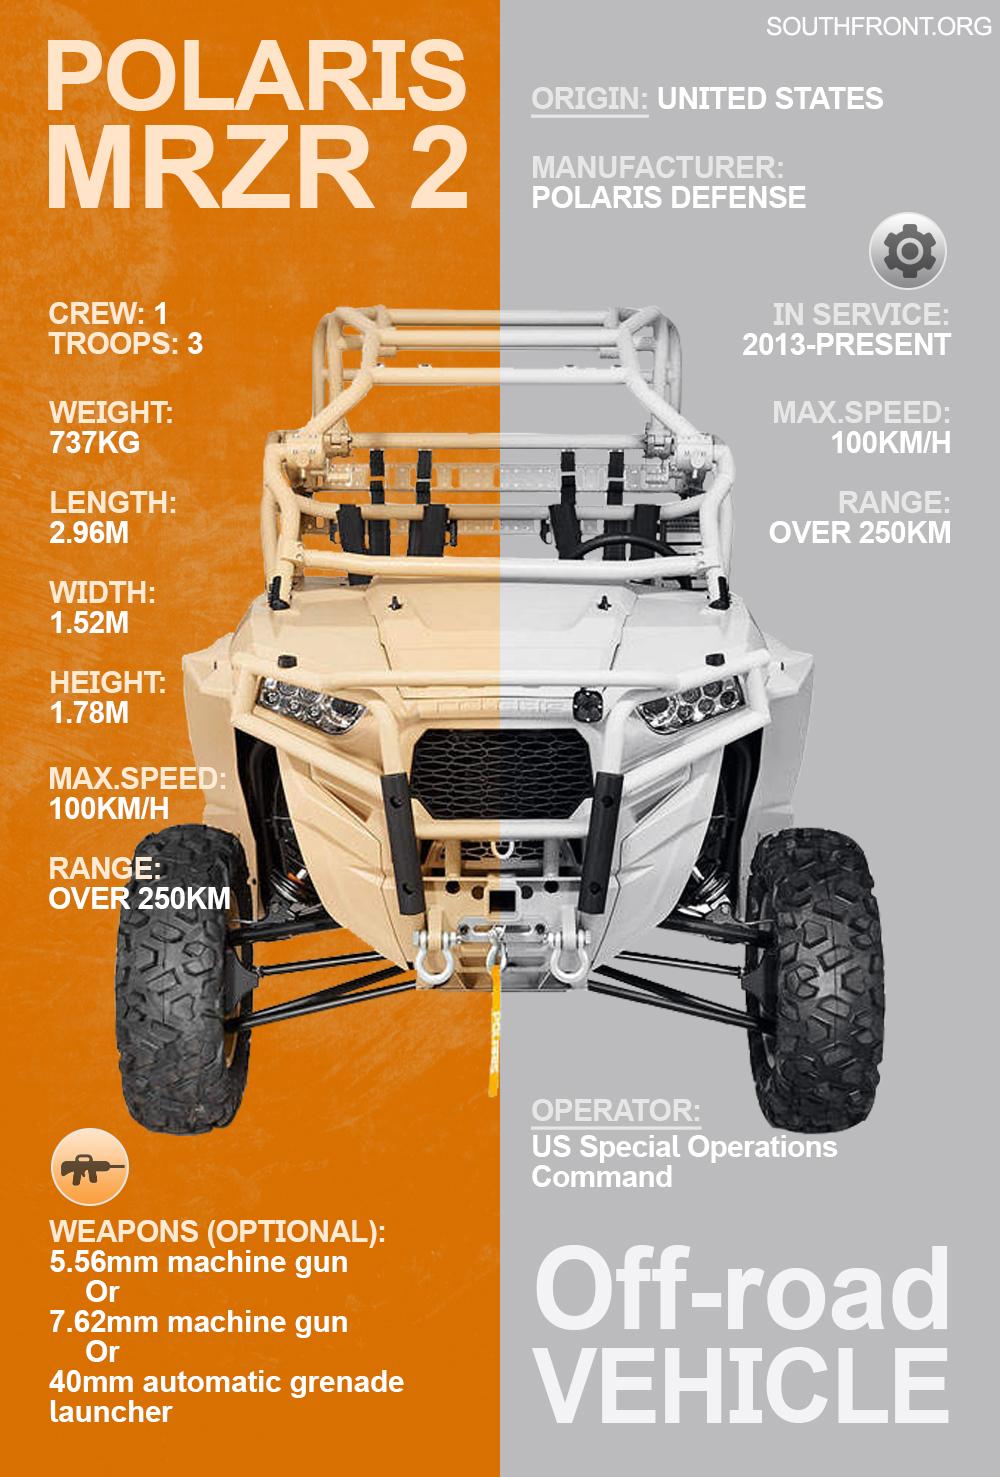 Polaris MRZR 2 Off-Road Vehicle (Infographics)